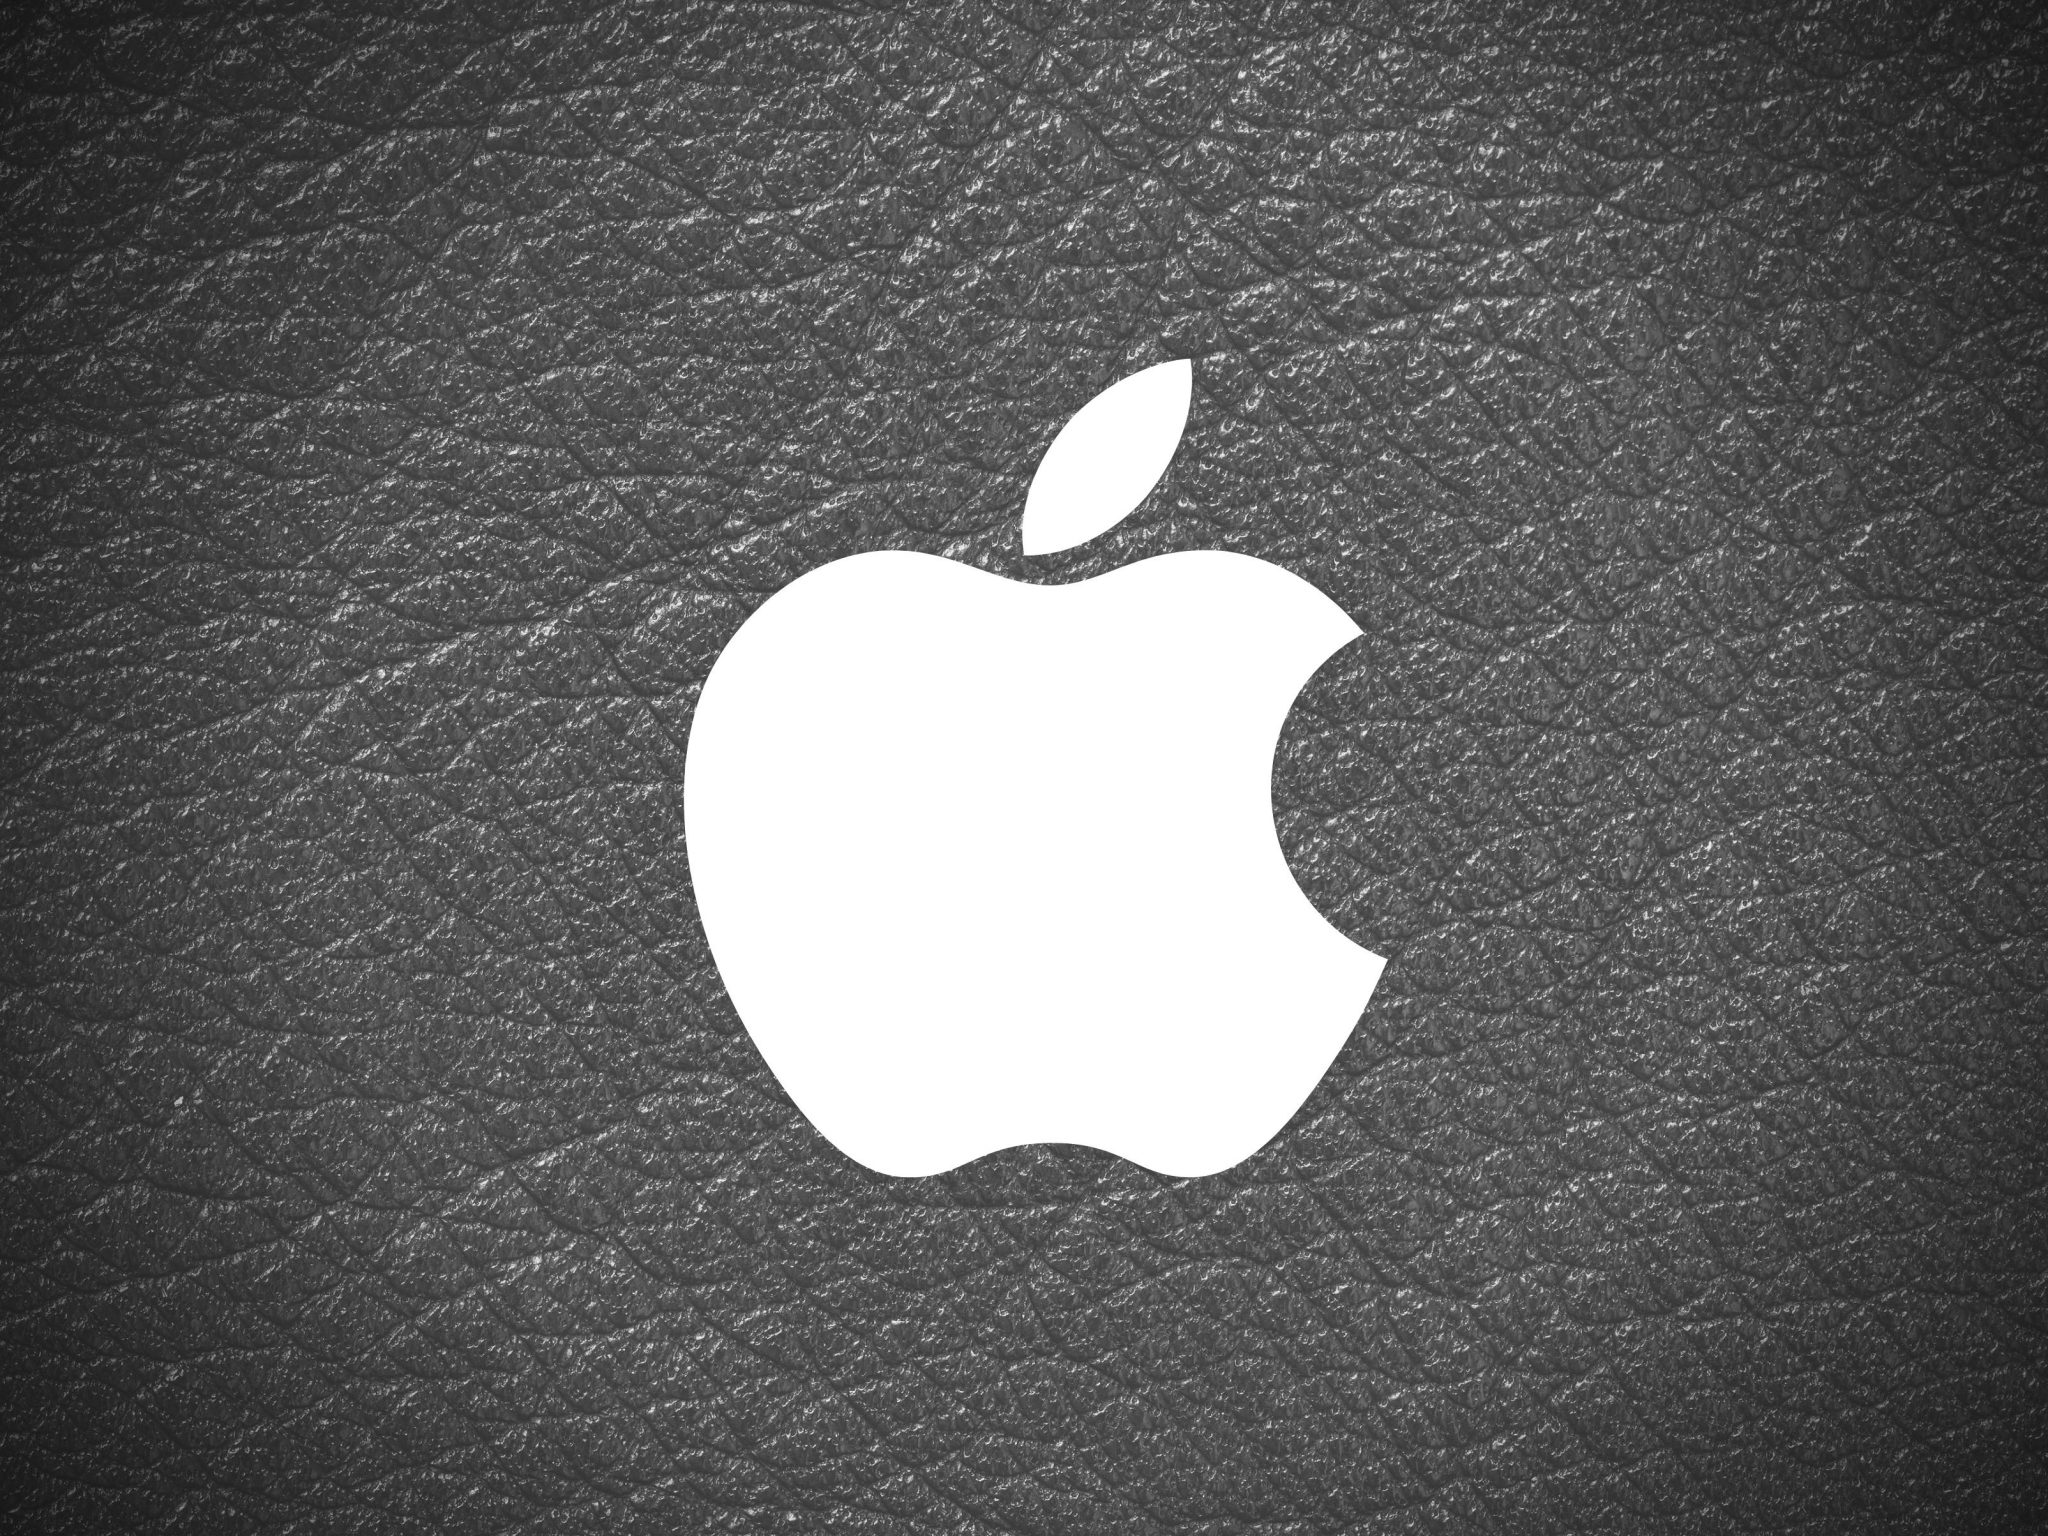 2048x1536 wallpaper Apple Logo Leather Black and White iPad Wallpaper 2048x1536 pixels resolution